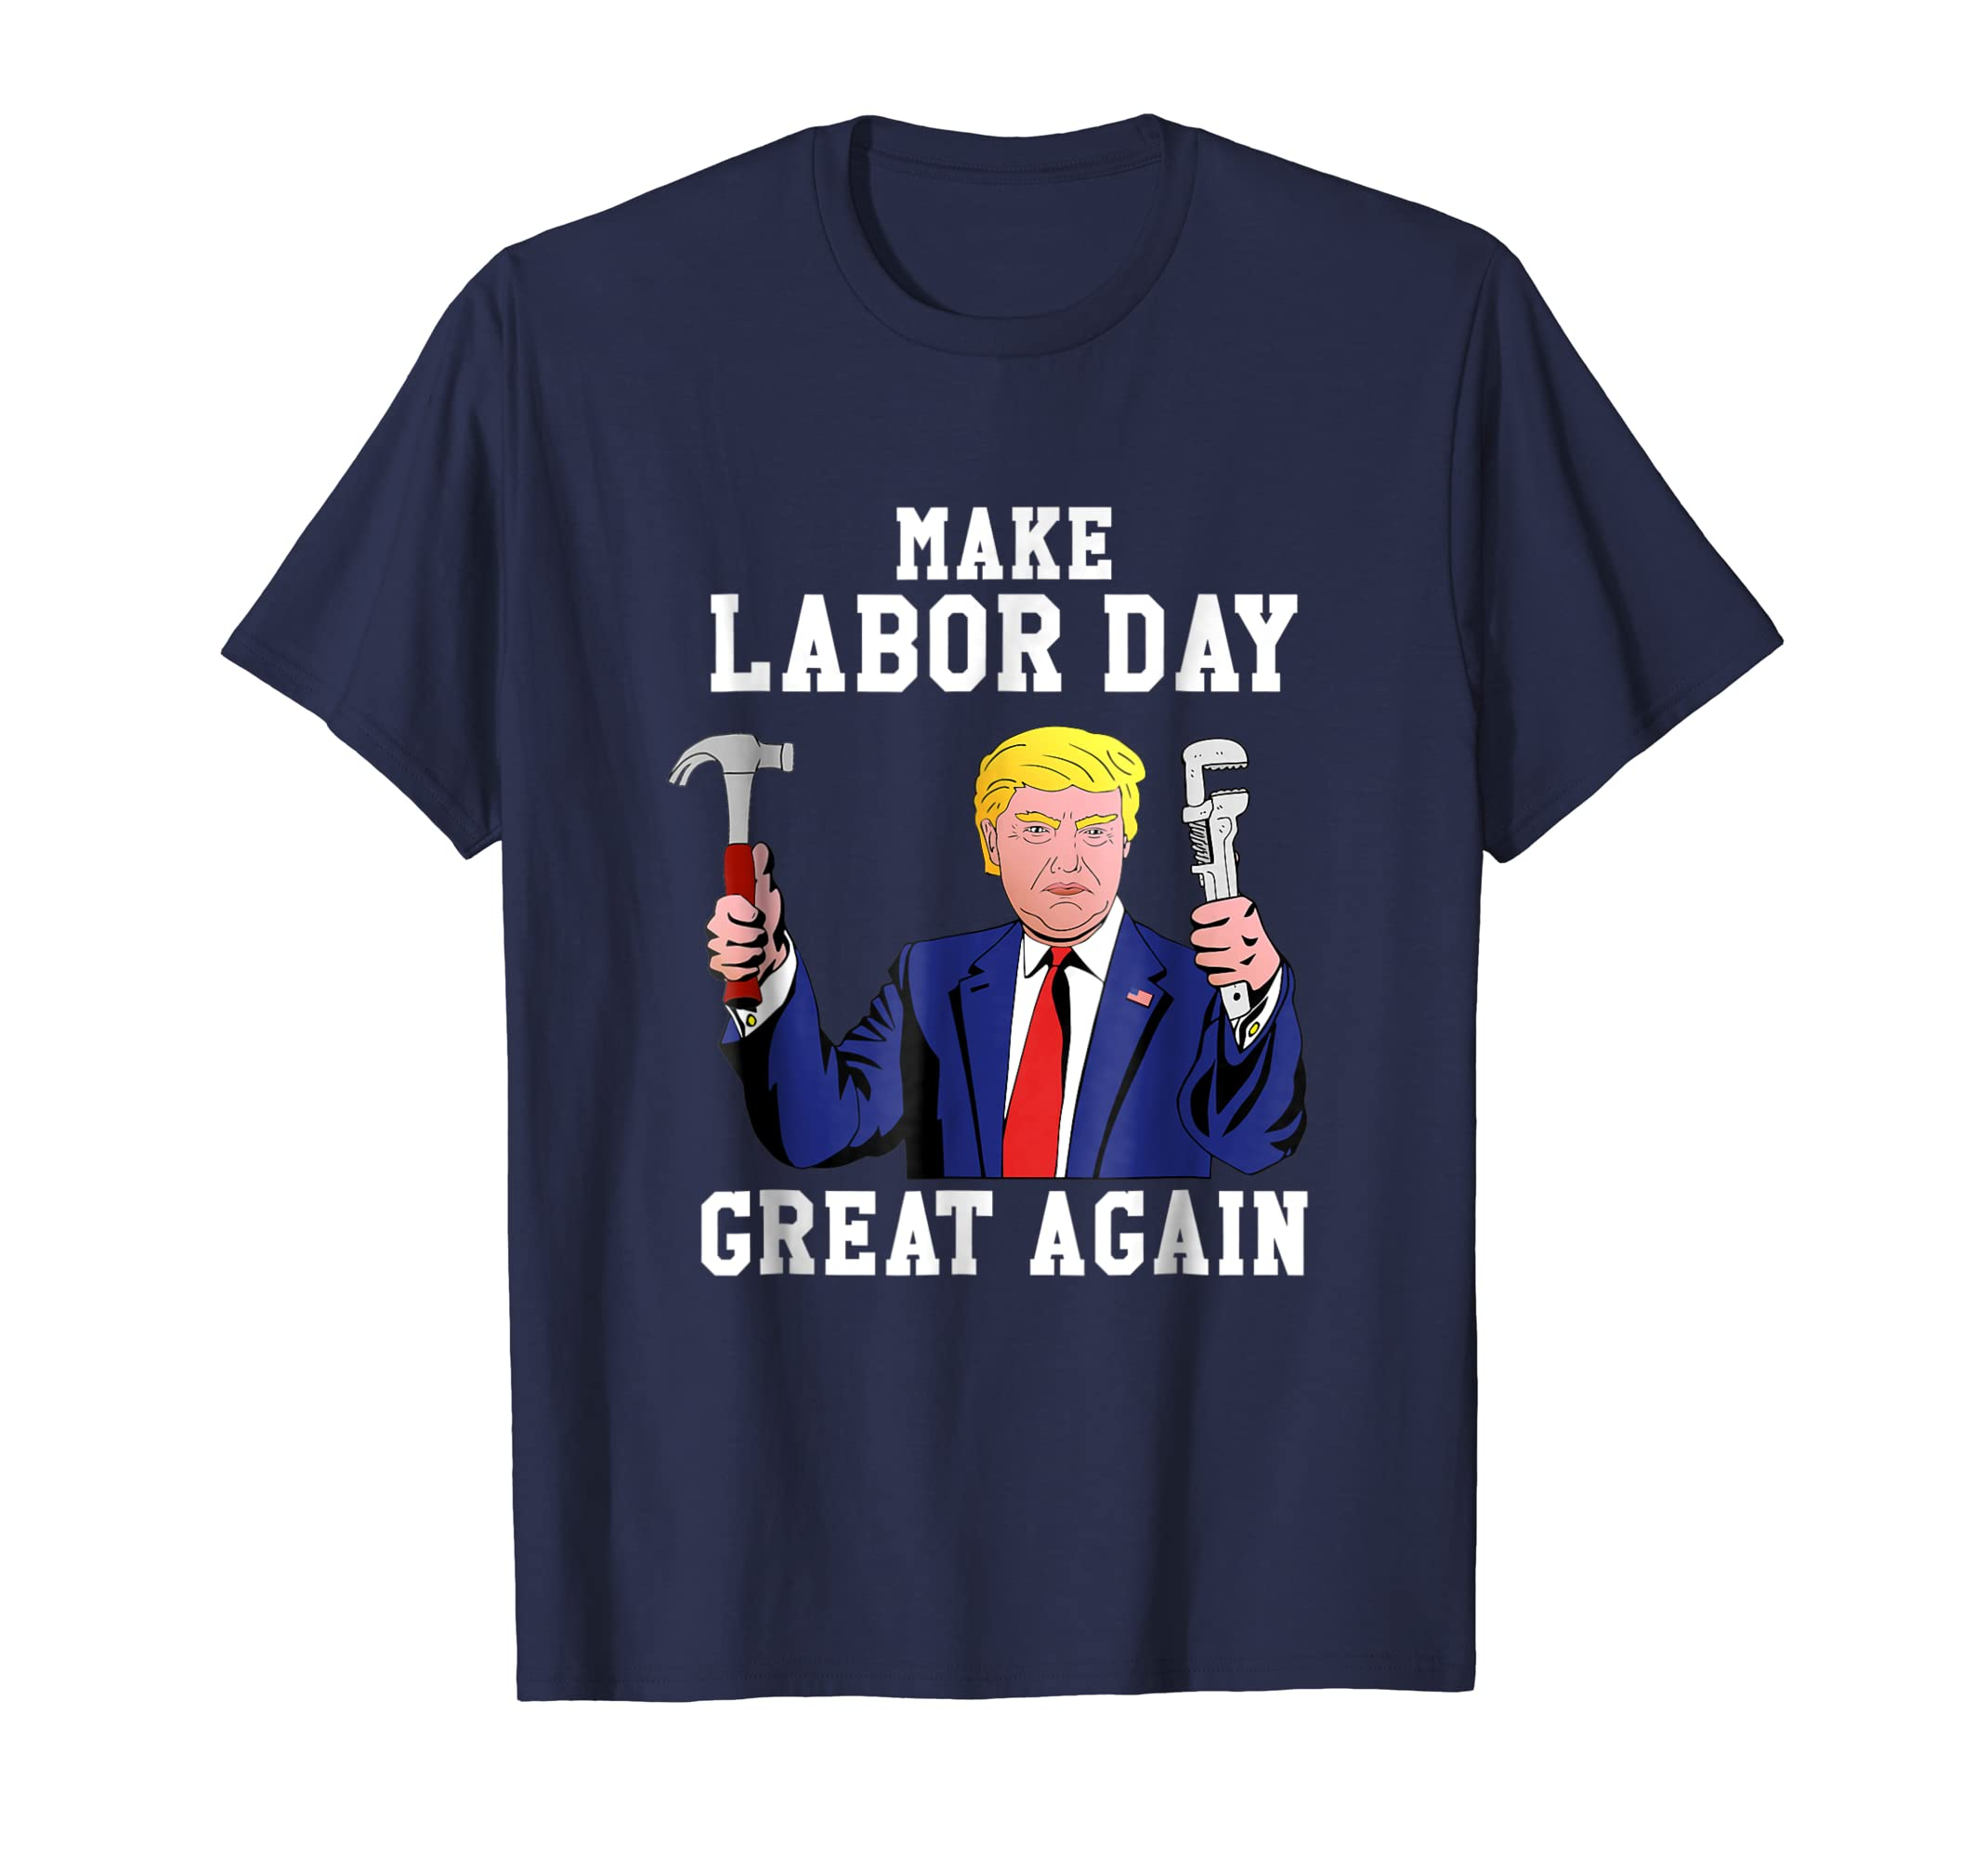 Make Labor Day Great Again Shirt, Labor Day Celebration Tee-Teehay